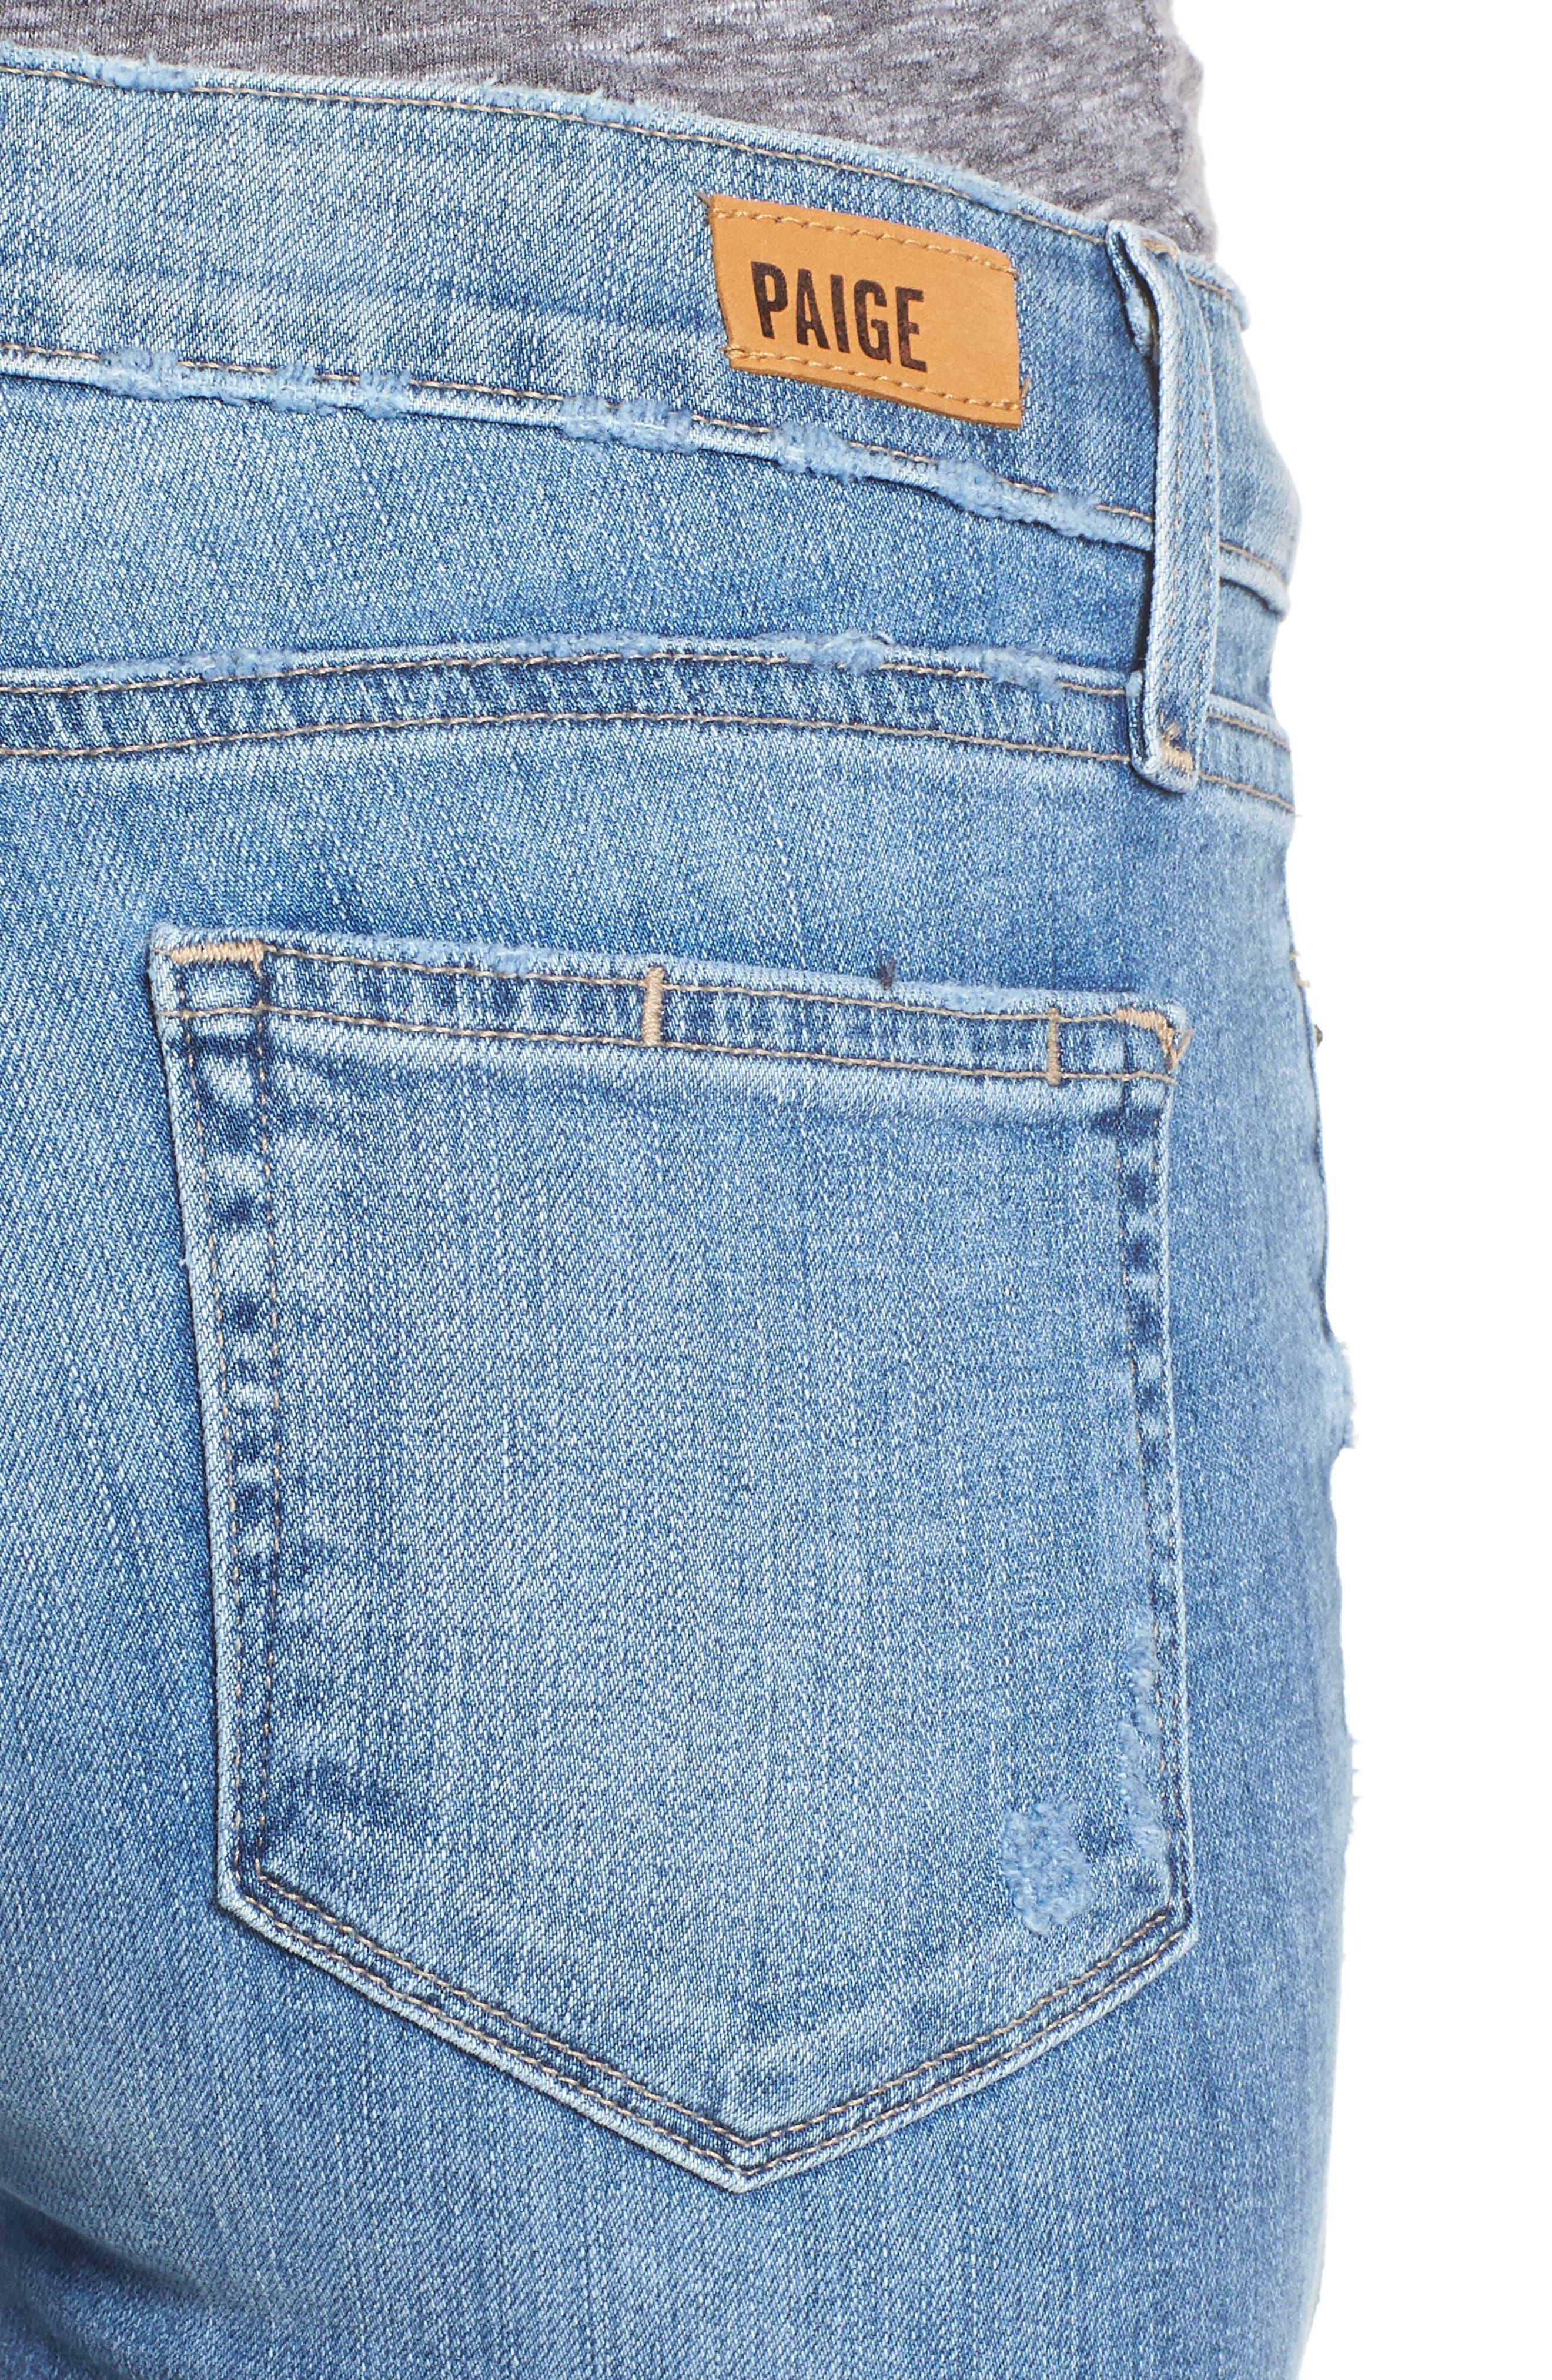 Transcend - Verdugo Ankle Ultra Skinny Jeans,                             Alternate thumbnail 4, color,                             400